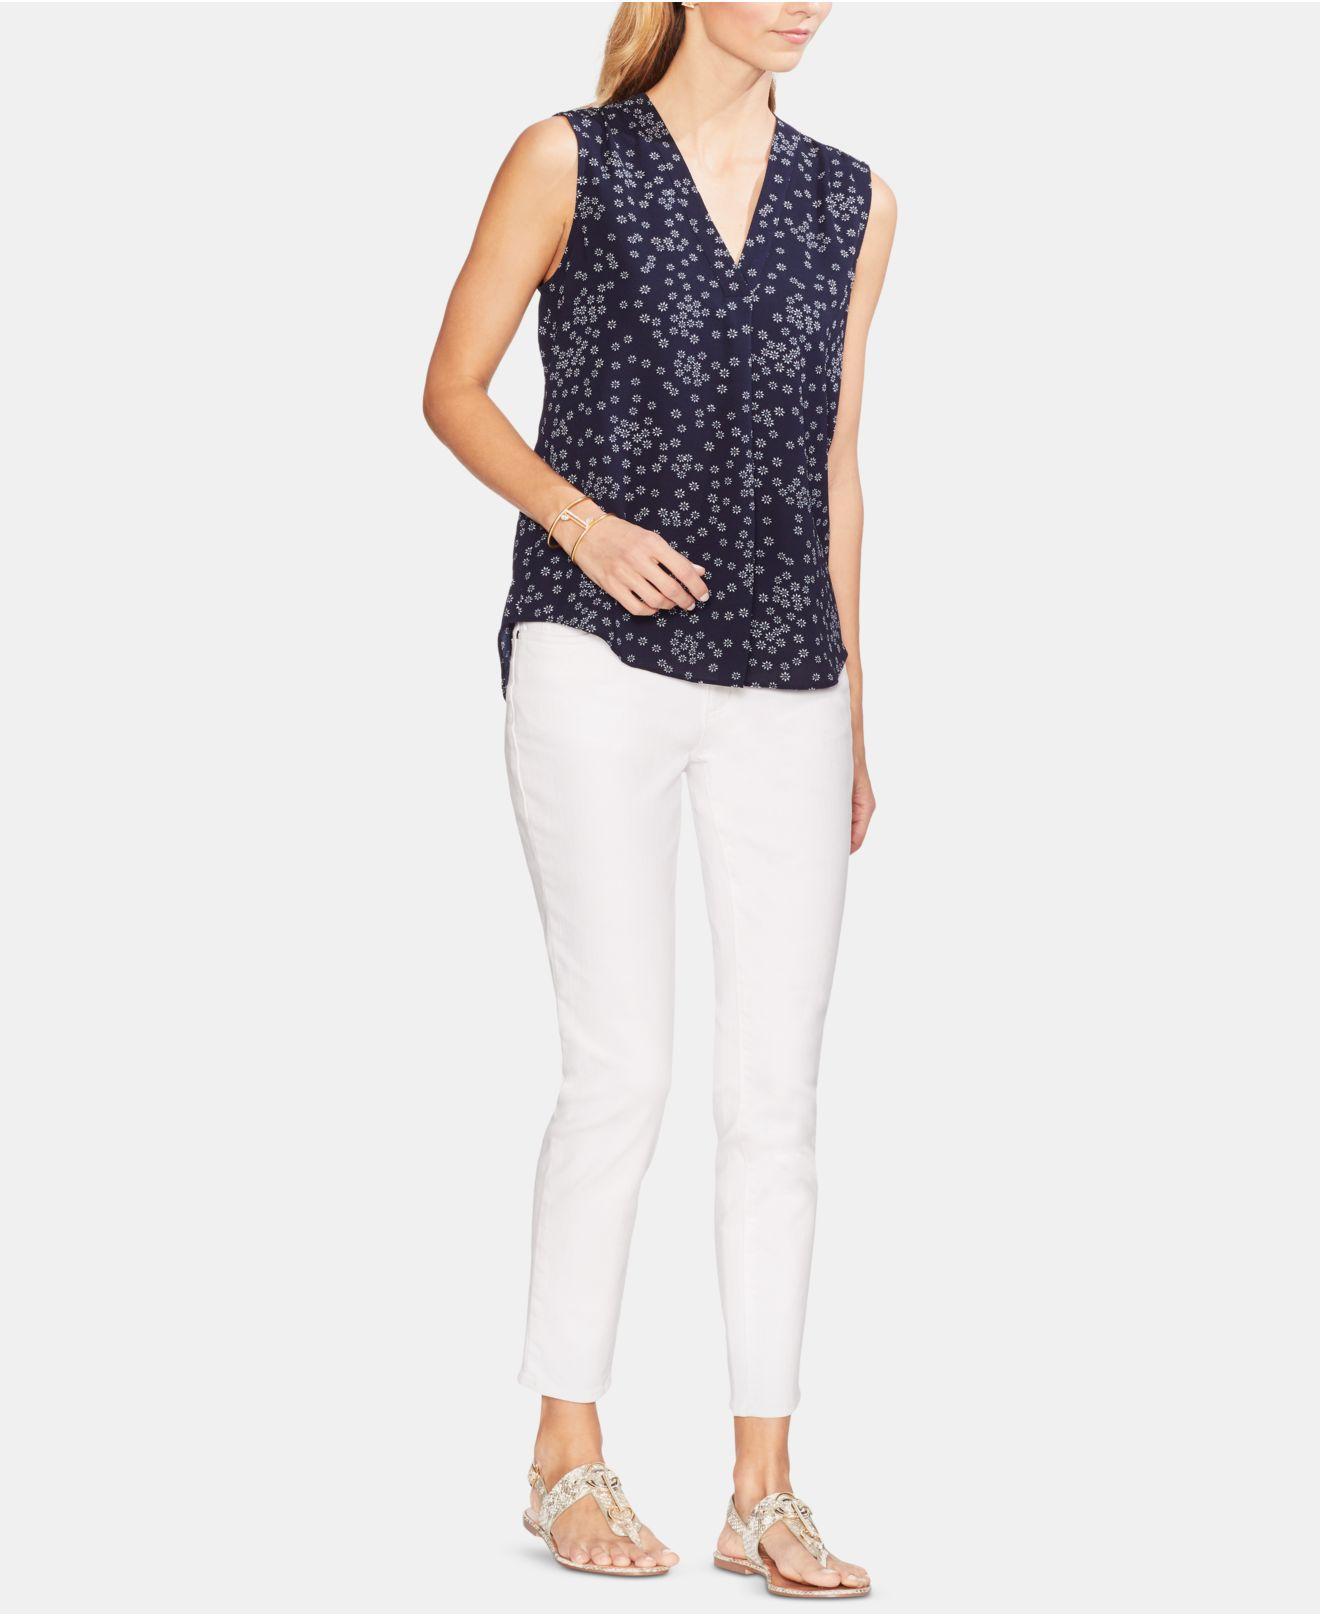 0d31923506e0ca Vince Camuto - Blue Floral-print Sleeveless Top - Lyst. View fullscreen